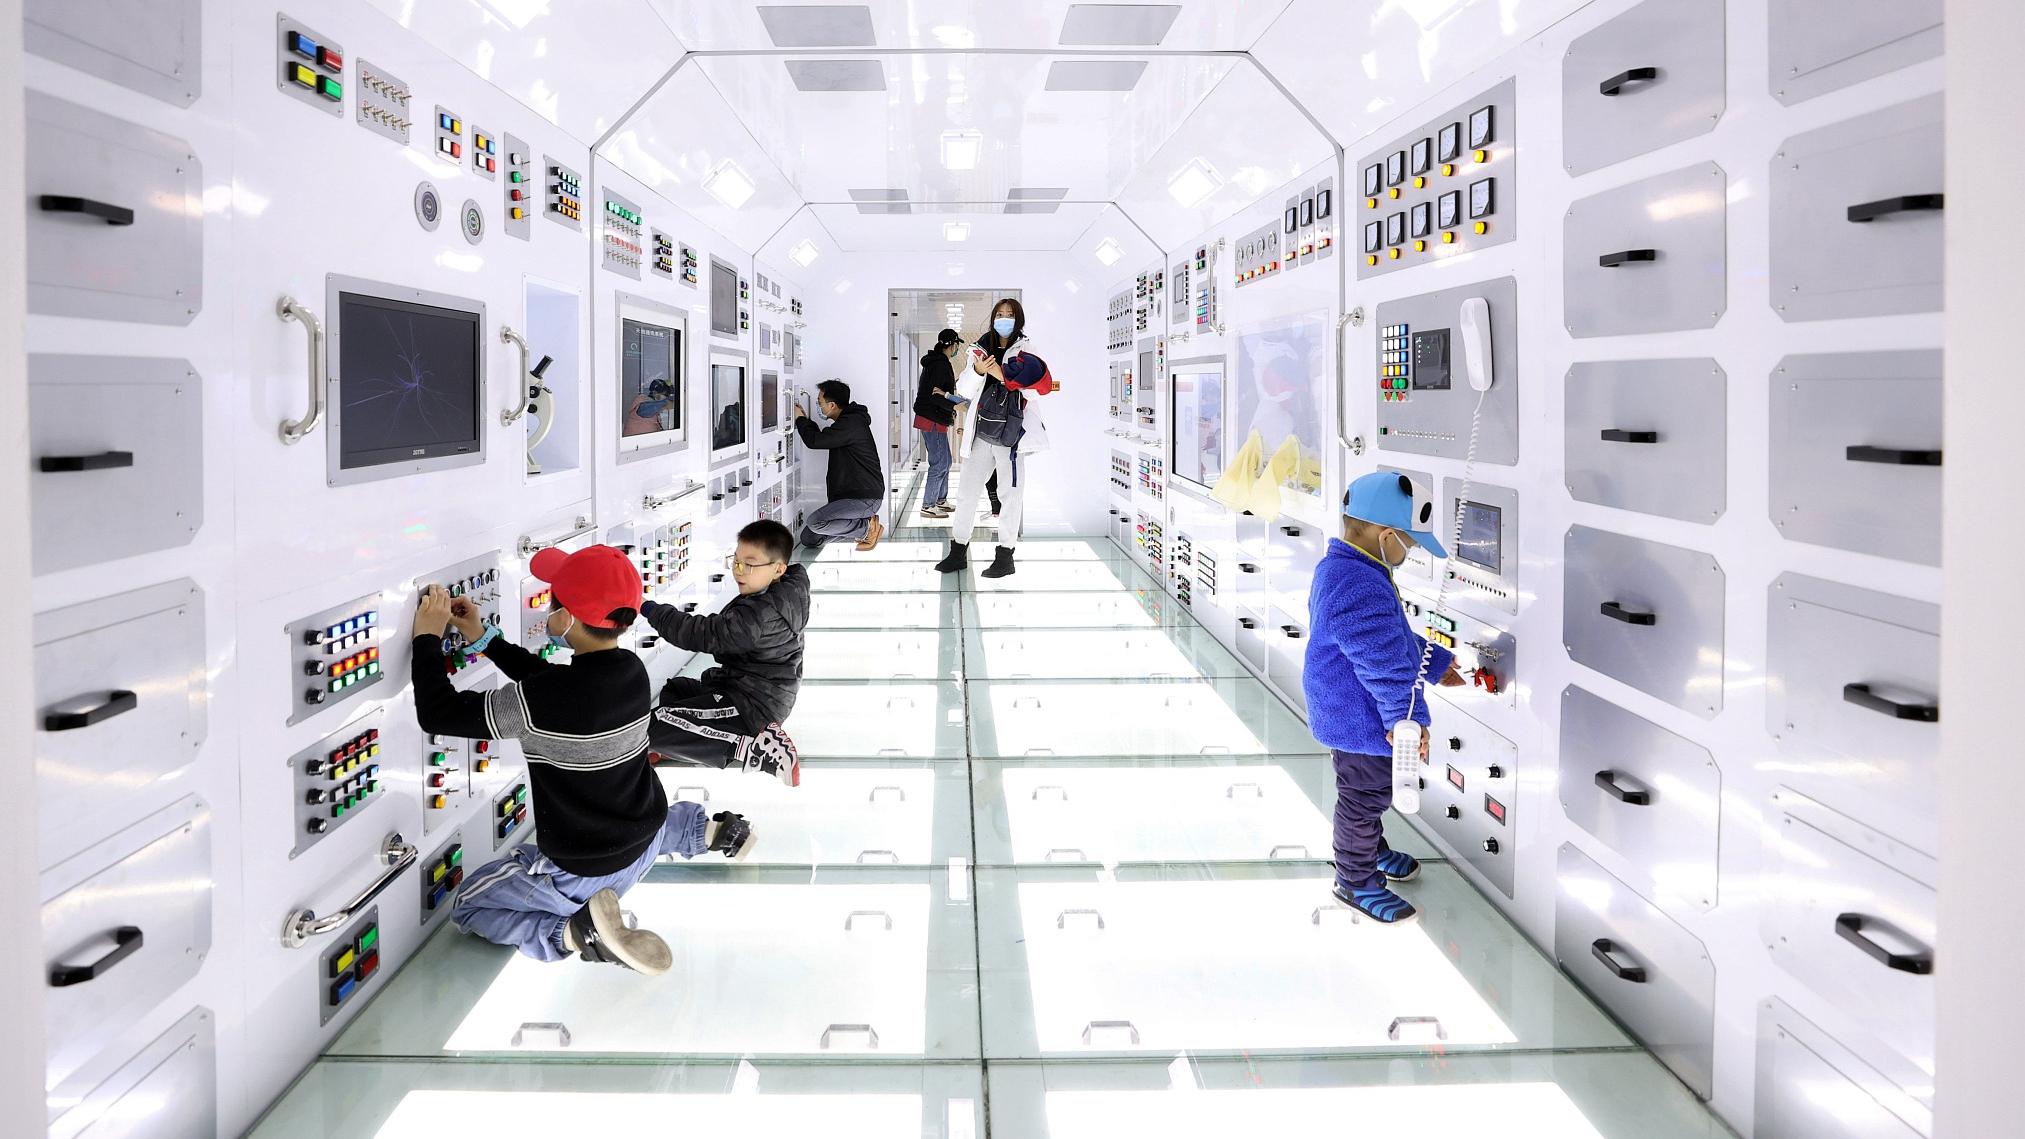 - ee9edd8c664845e08e616136c10cbc48 - China Space station: The tech that sets it apart